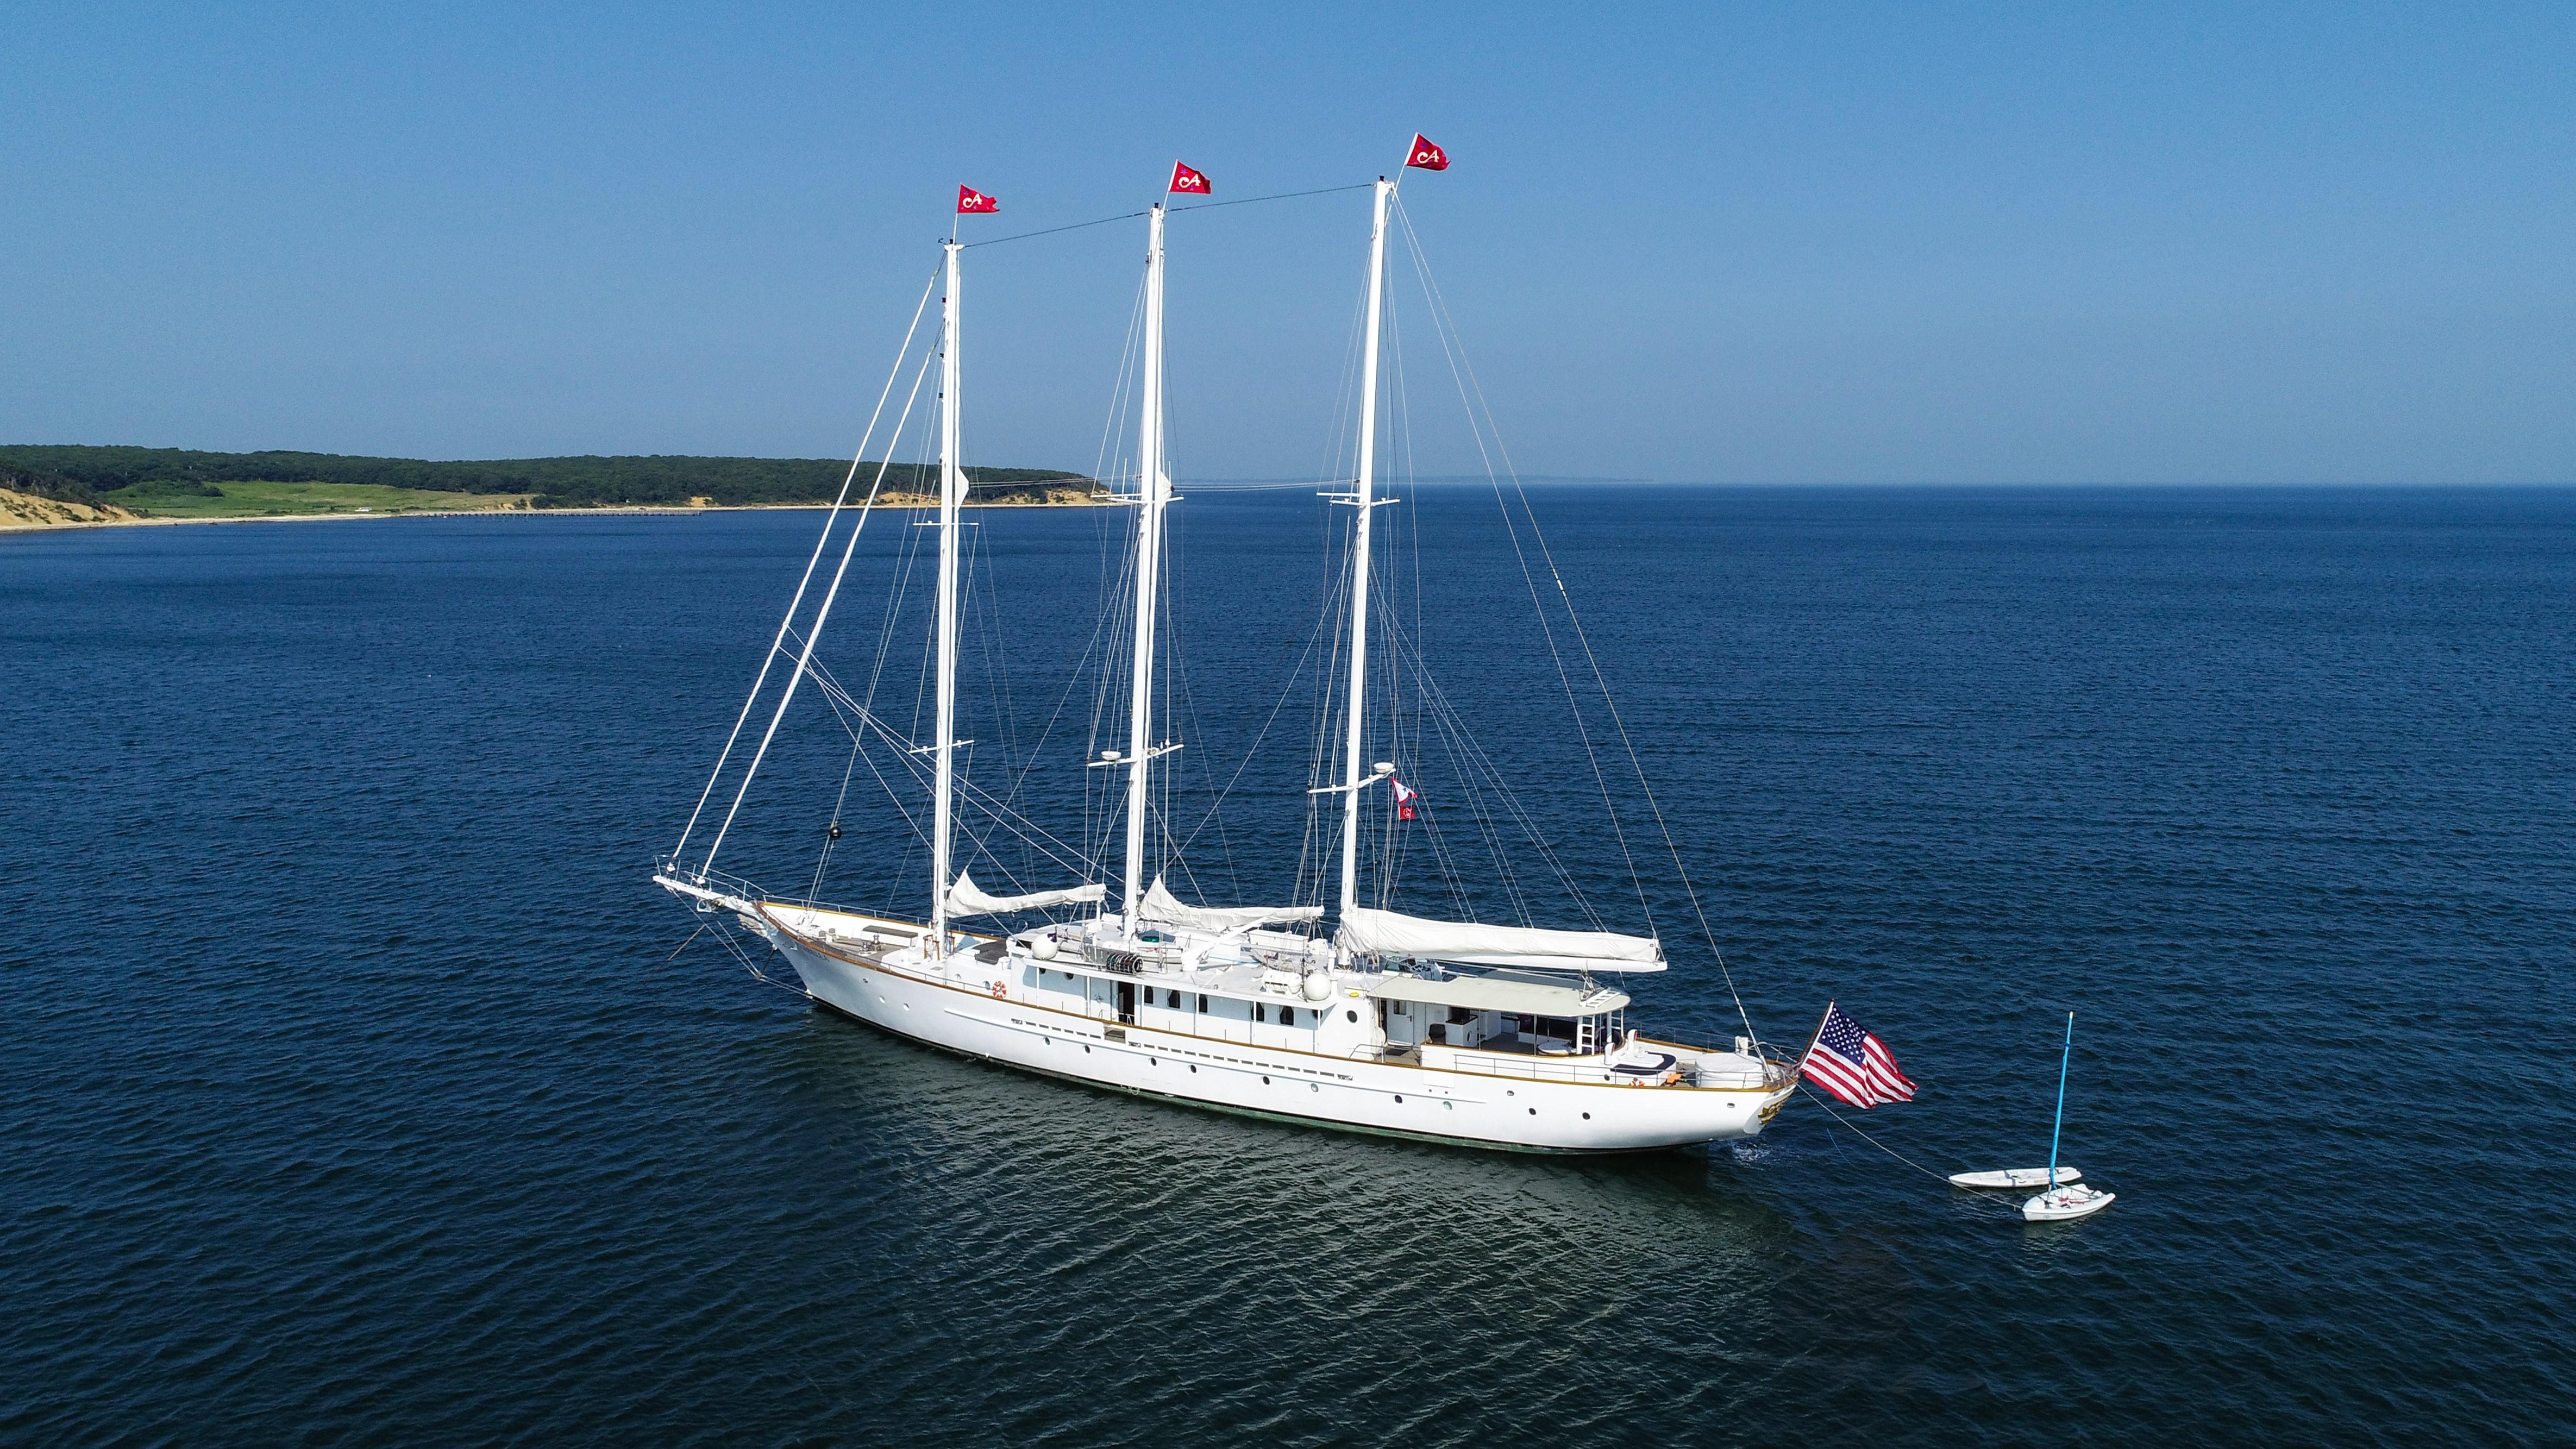 Watch New York SailGP from the Megayacht Arabella – June 21 & 22